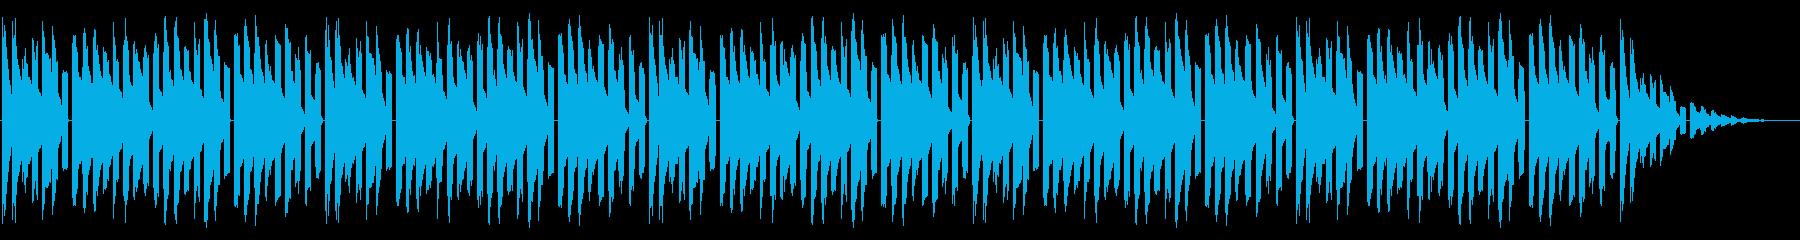 GB風RPGのタイトル曲の再生済みの波形